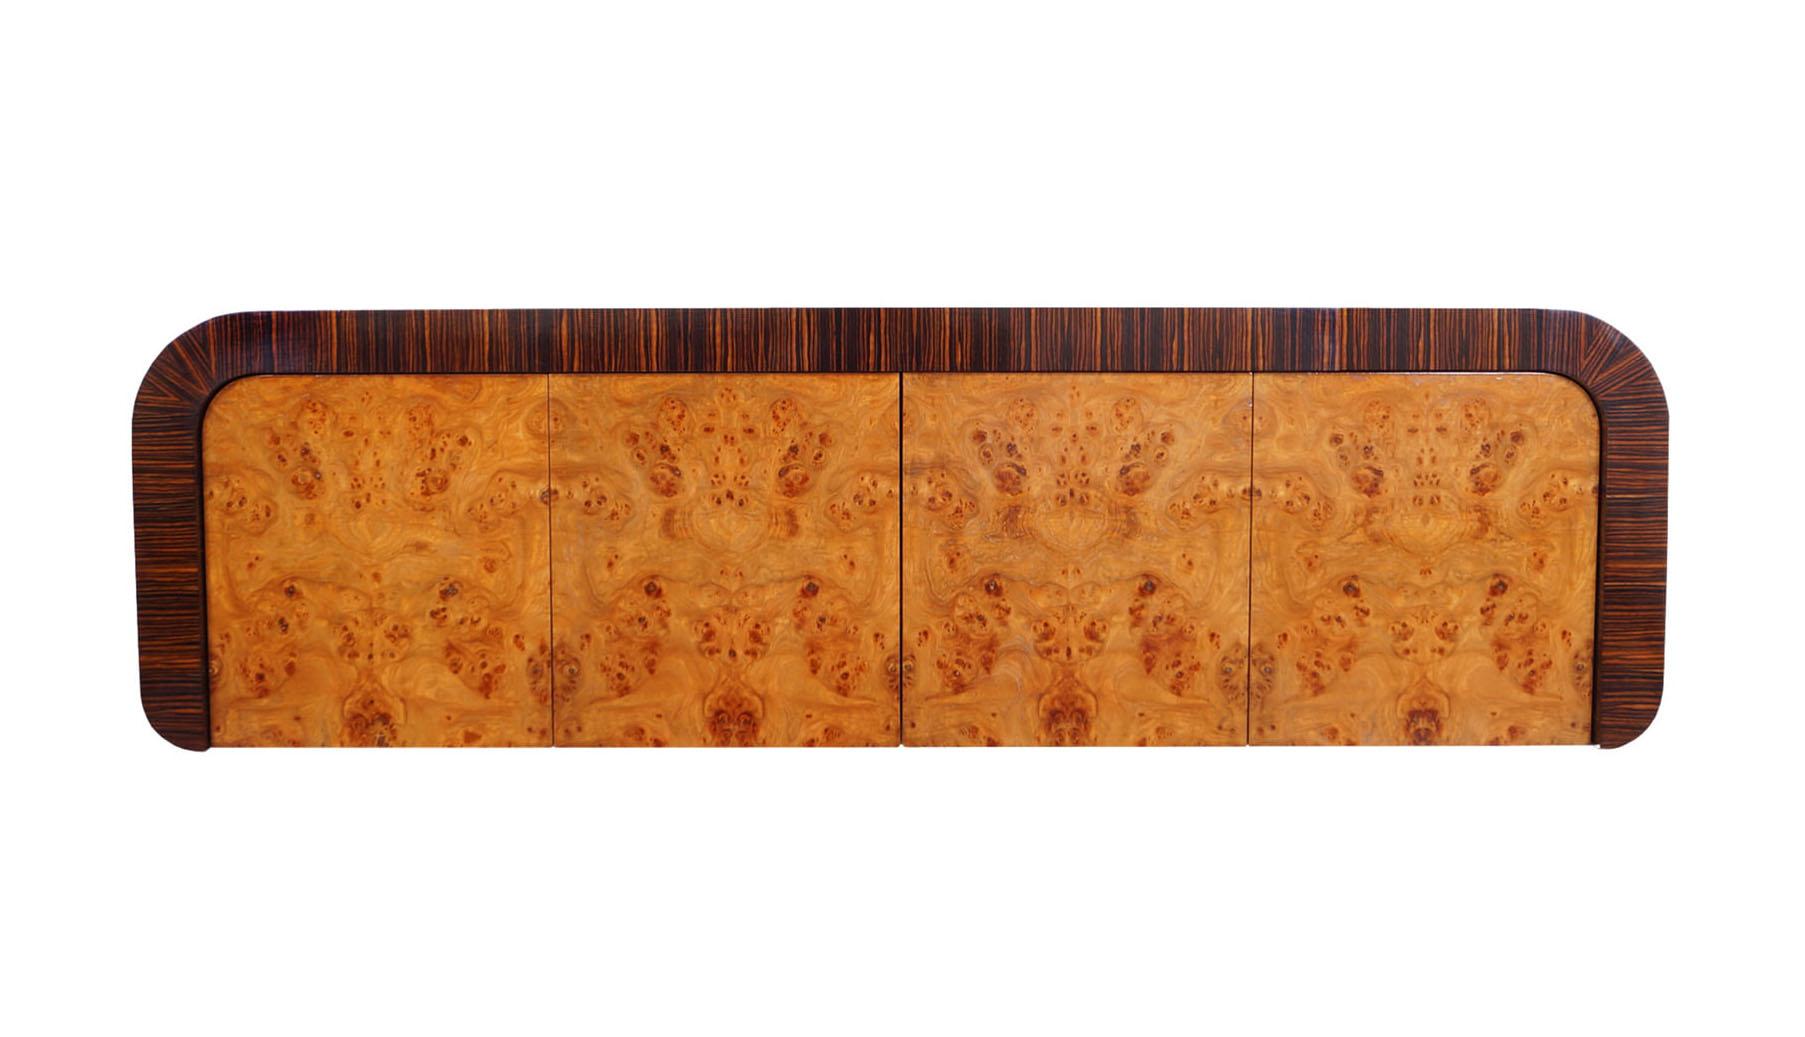 Vintage Burl Wood Wall Mounted Credenza